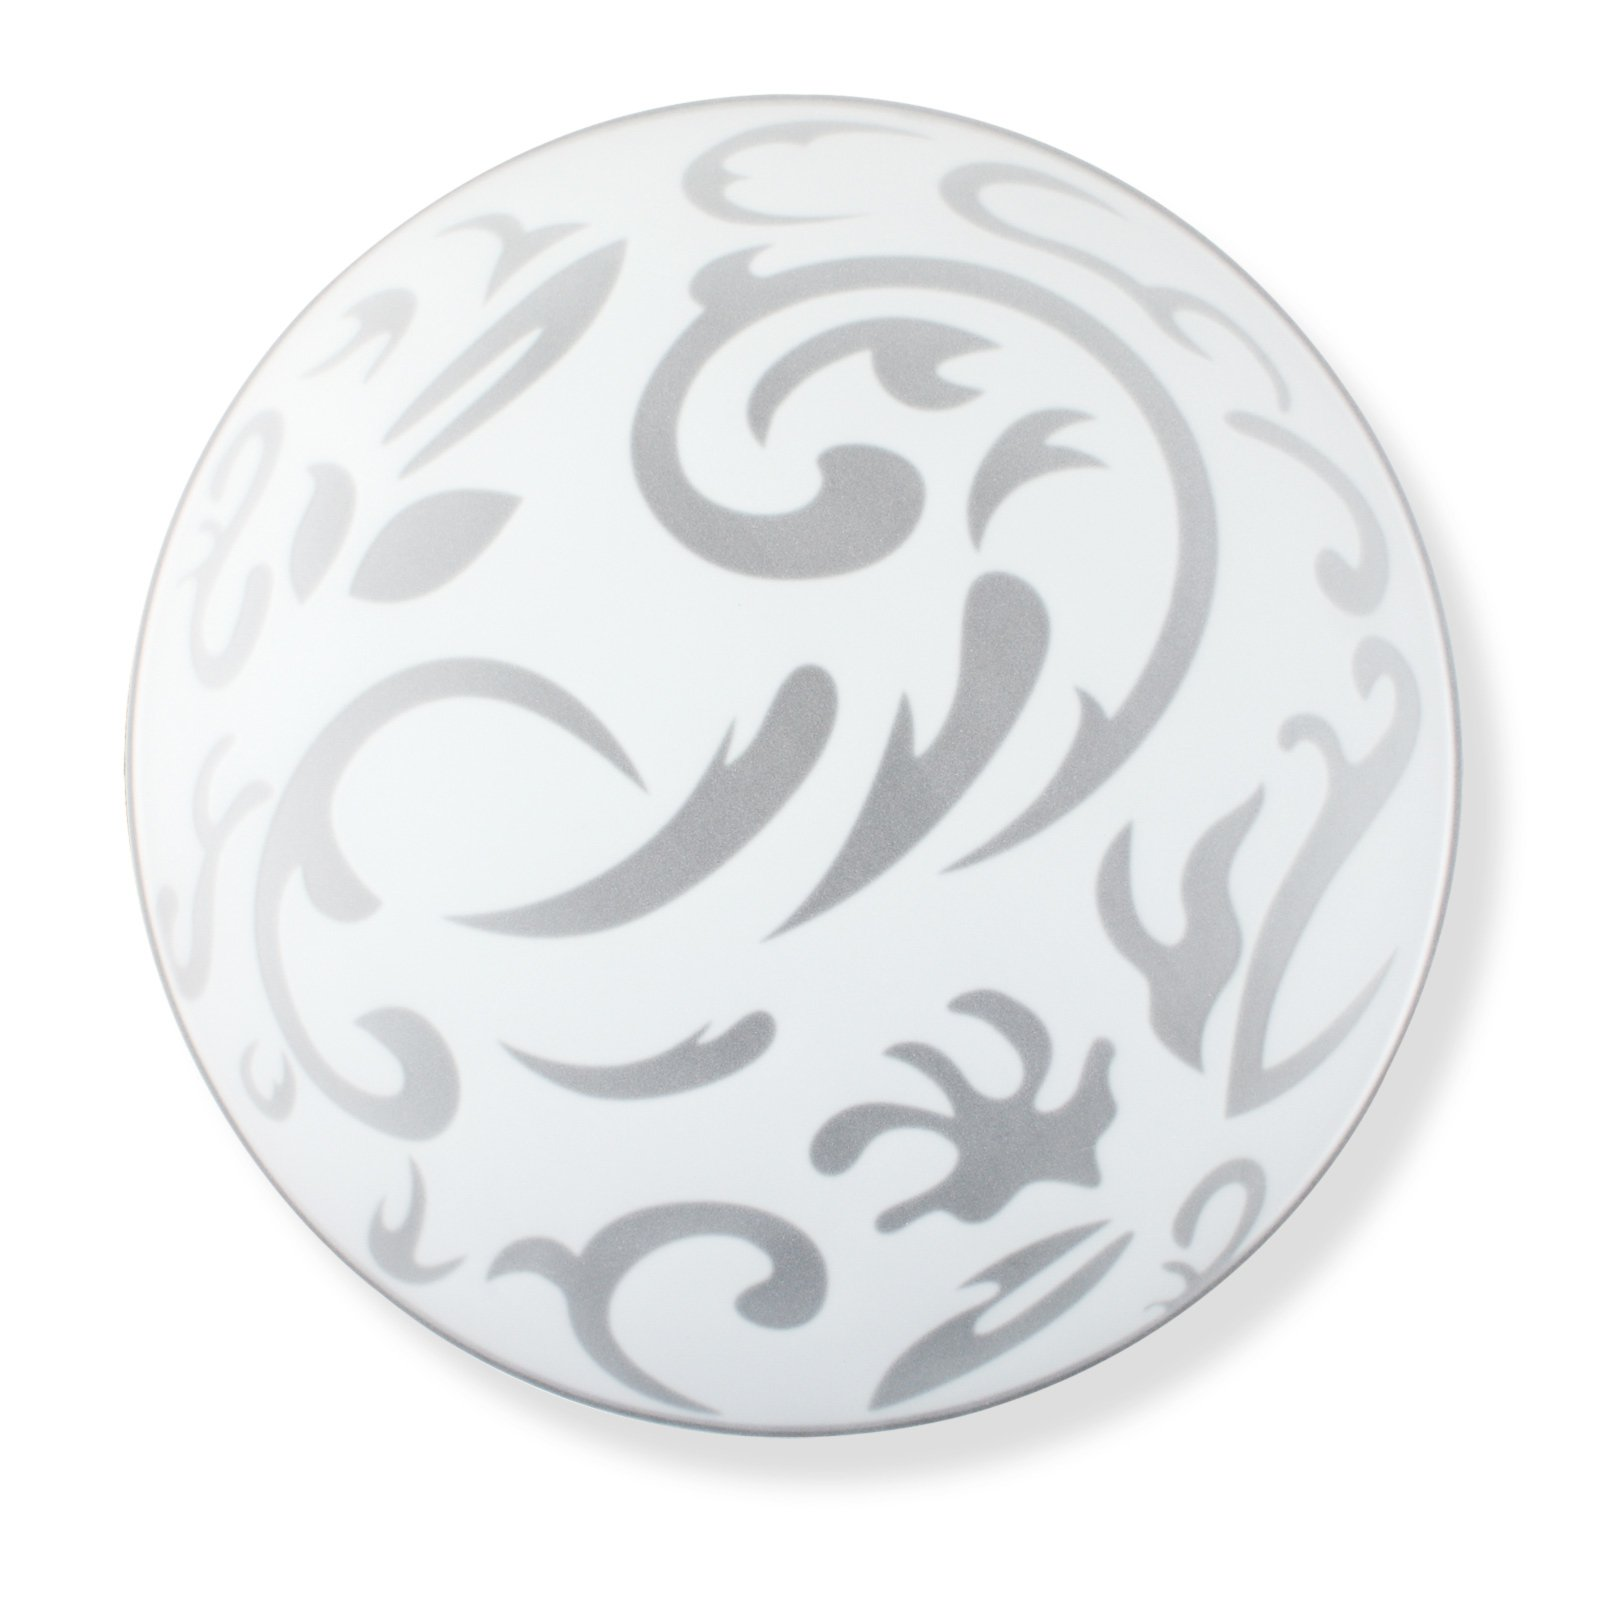 Deckenleuchte ORNAMENTIC - Glas - 25 cm